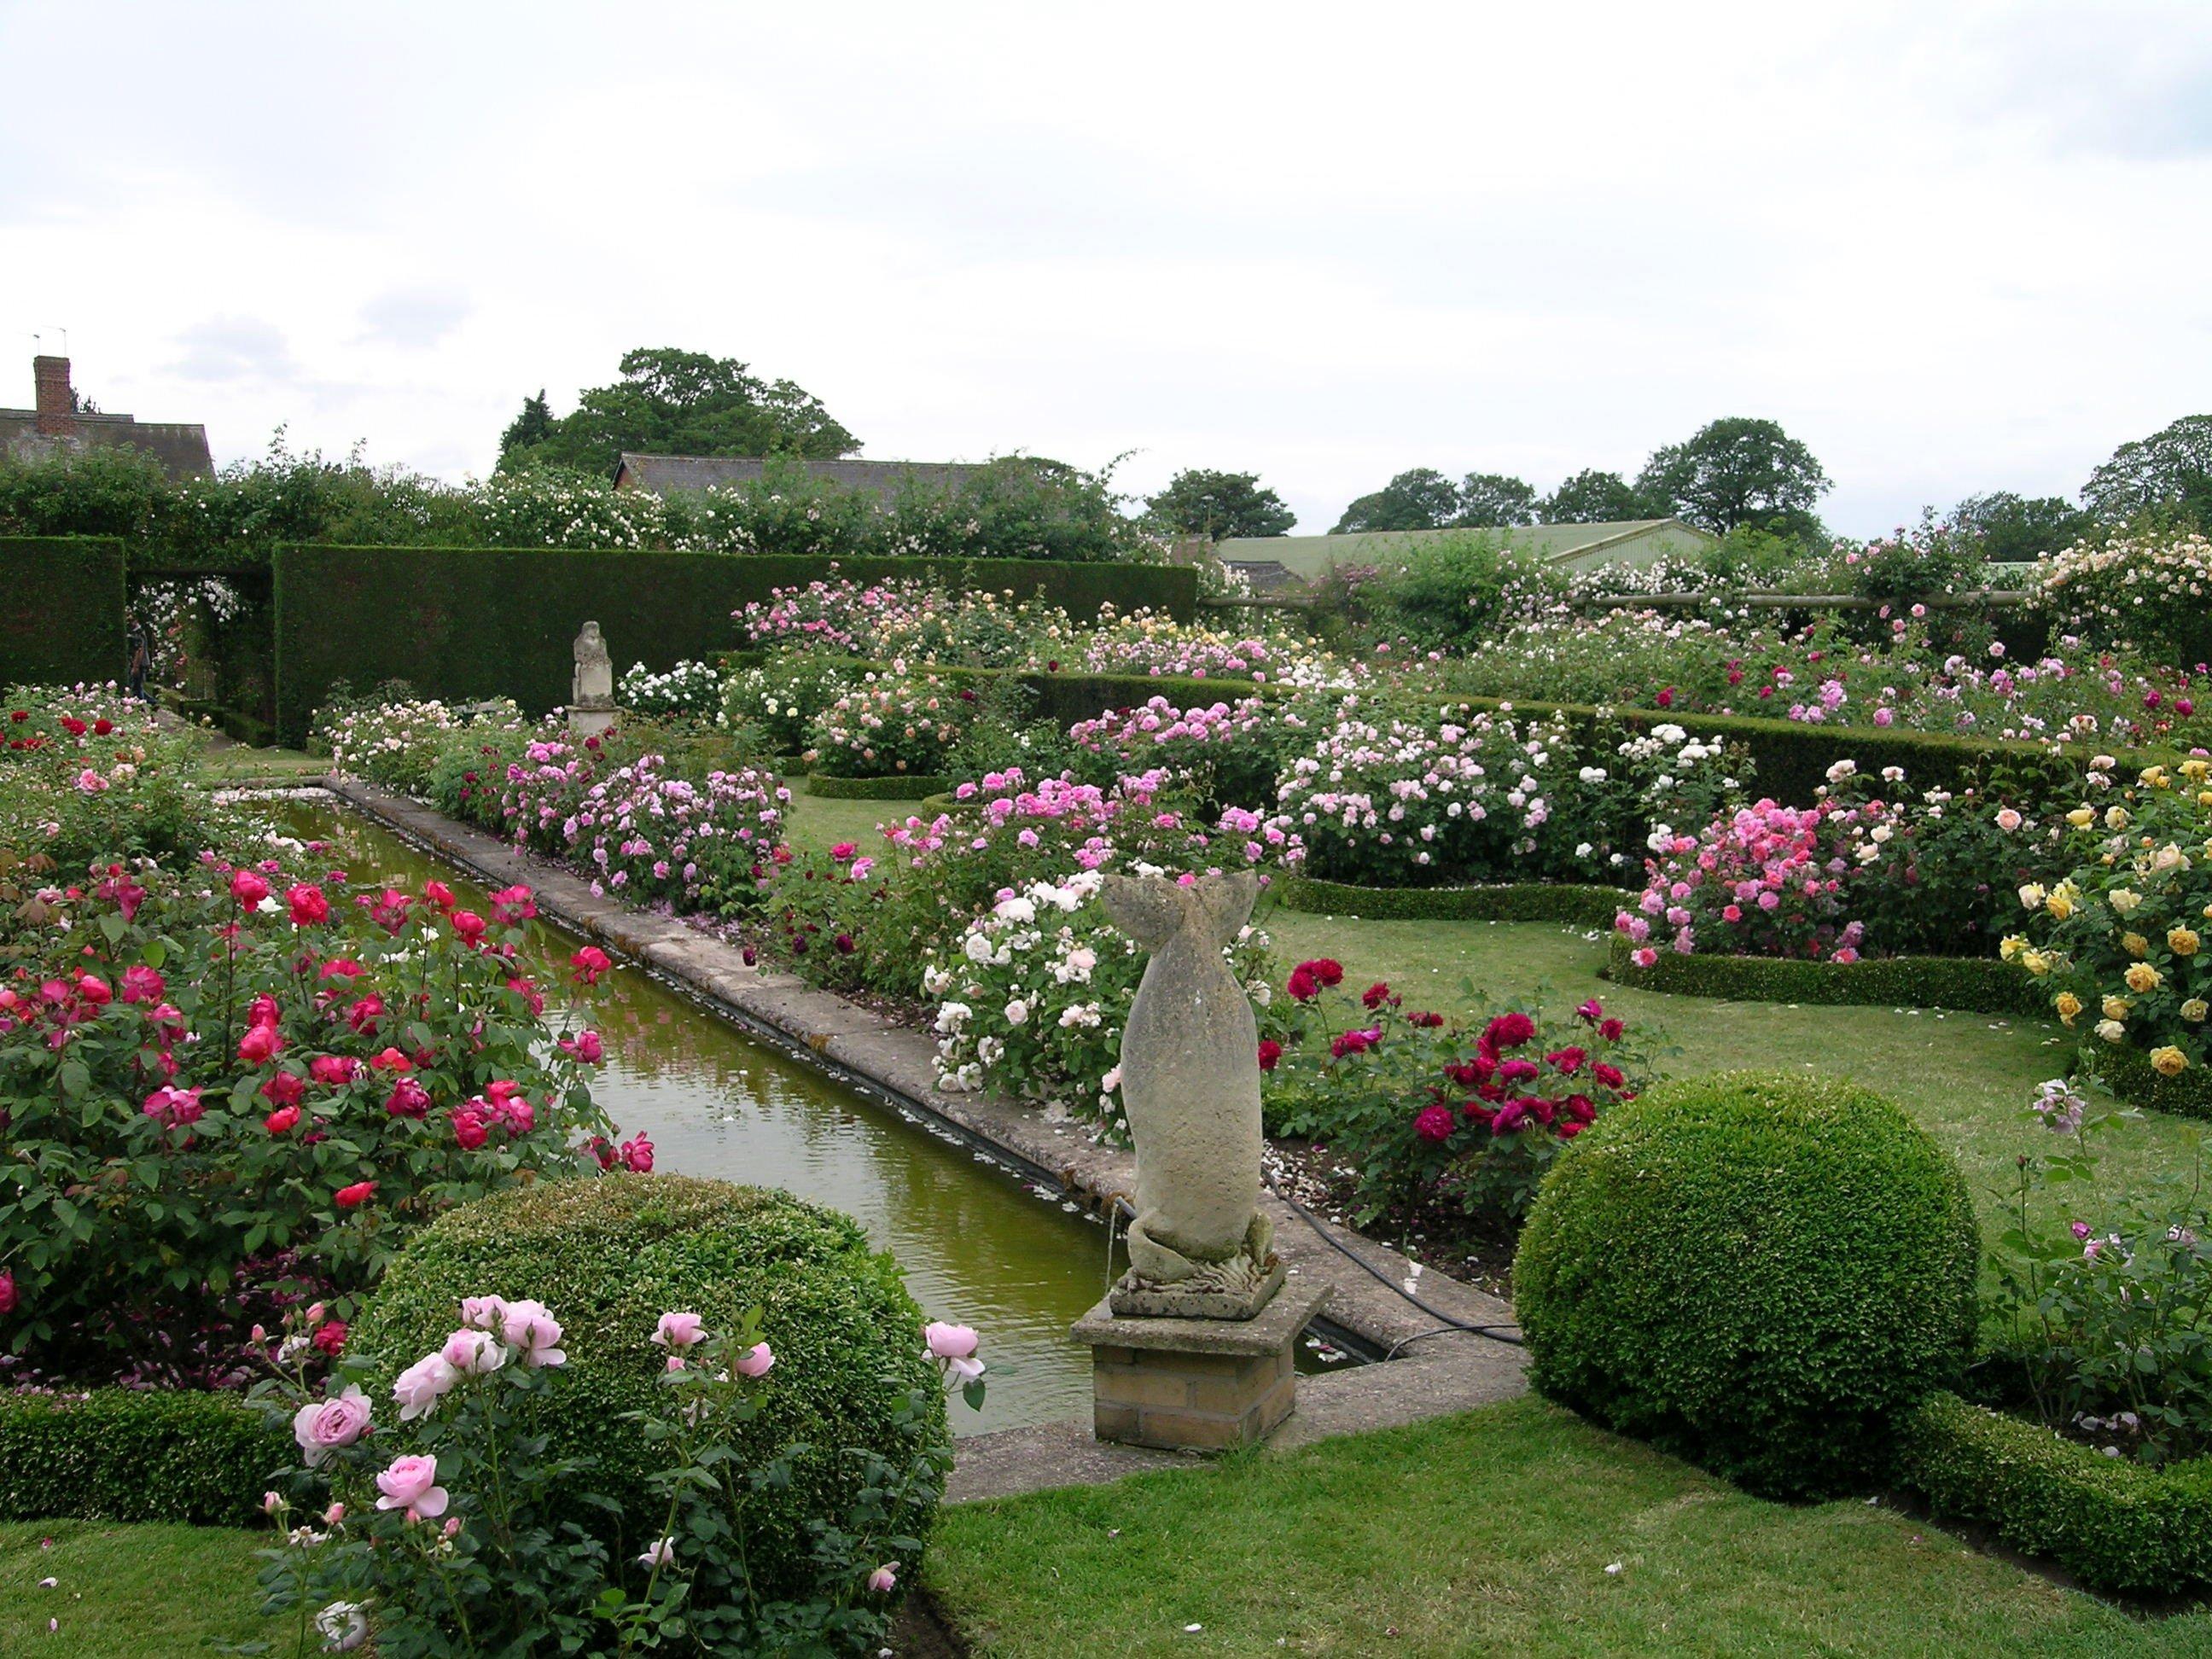 The garden at David Austin Roses, Albrighton, Shropshire, features hundreds of roses. Photos:...